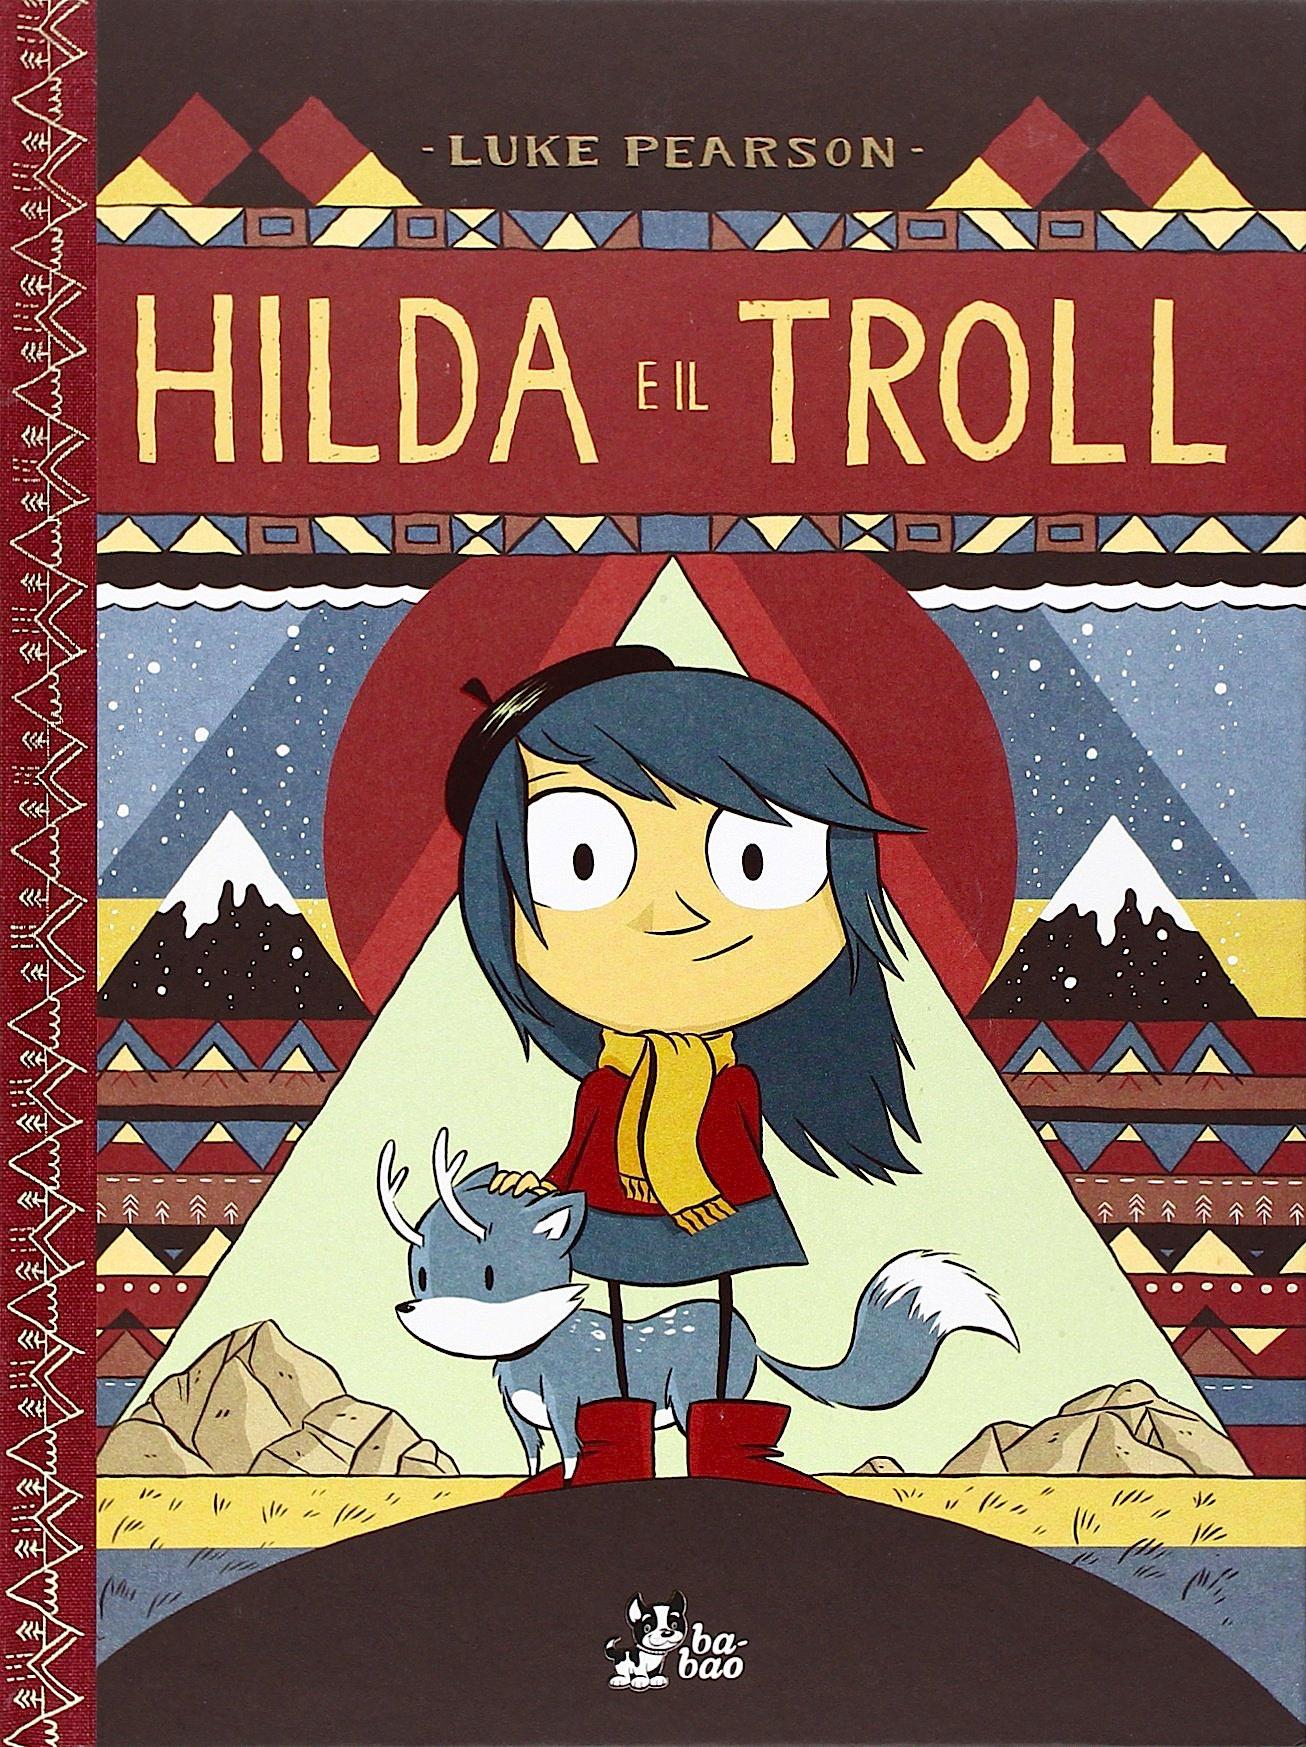 Hilda vol. 1